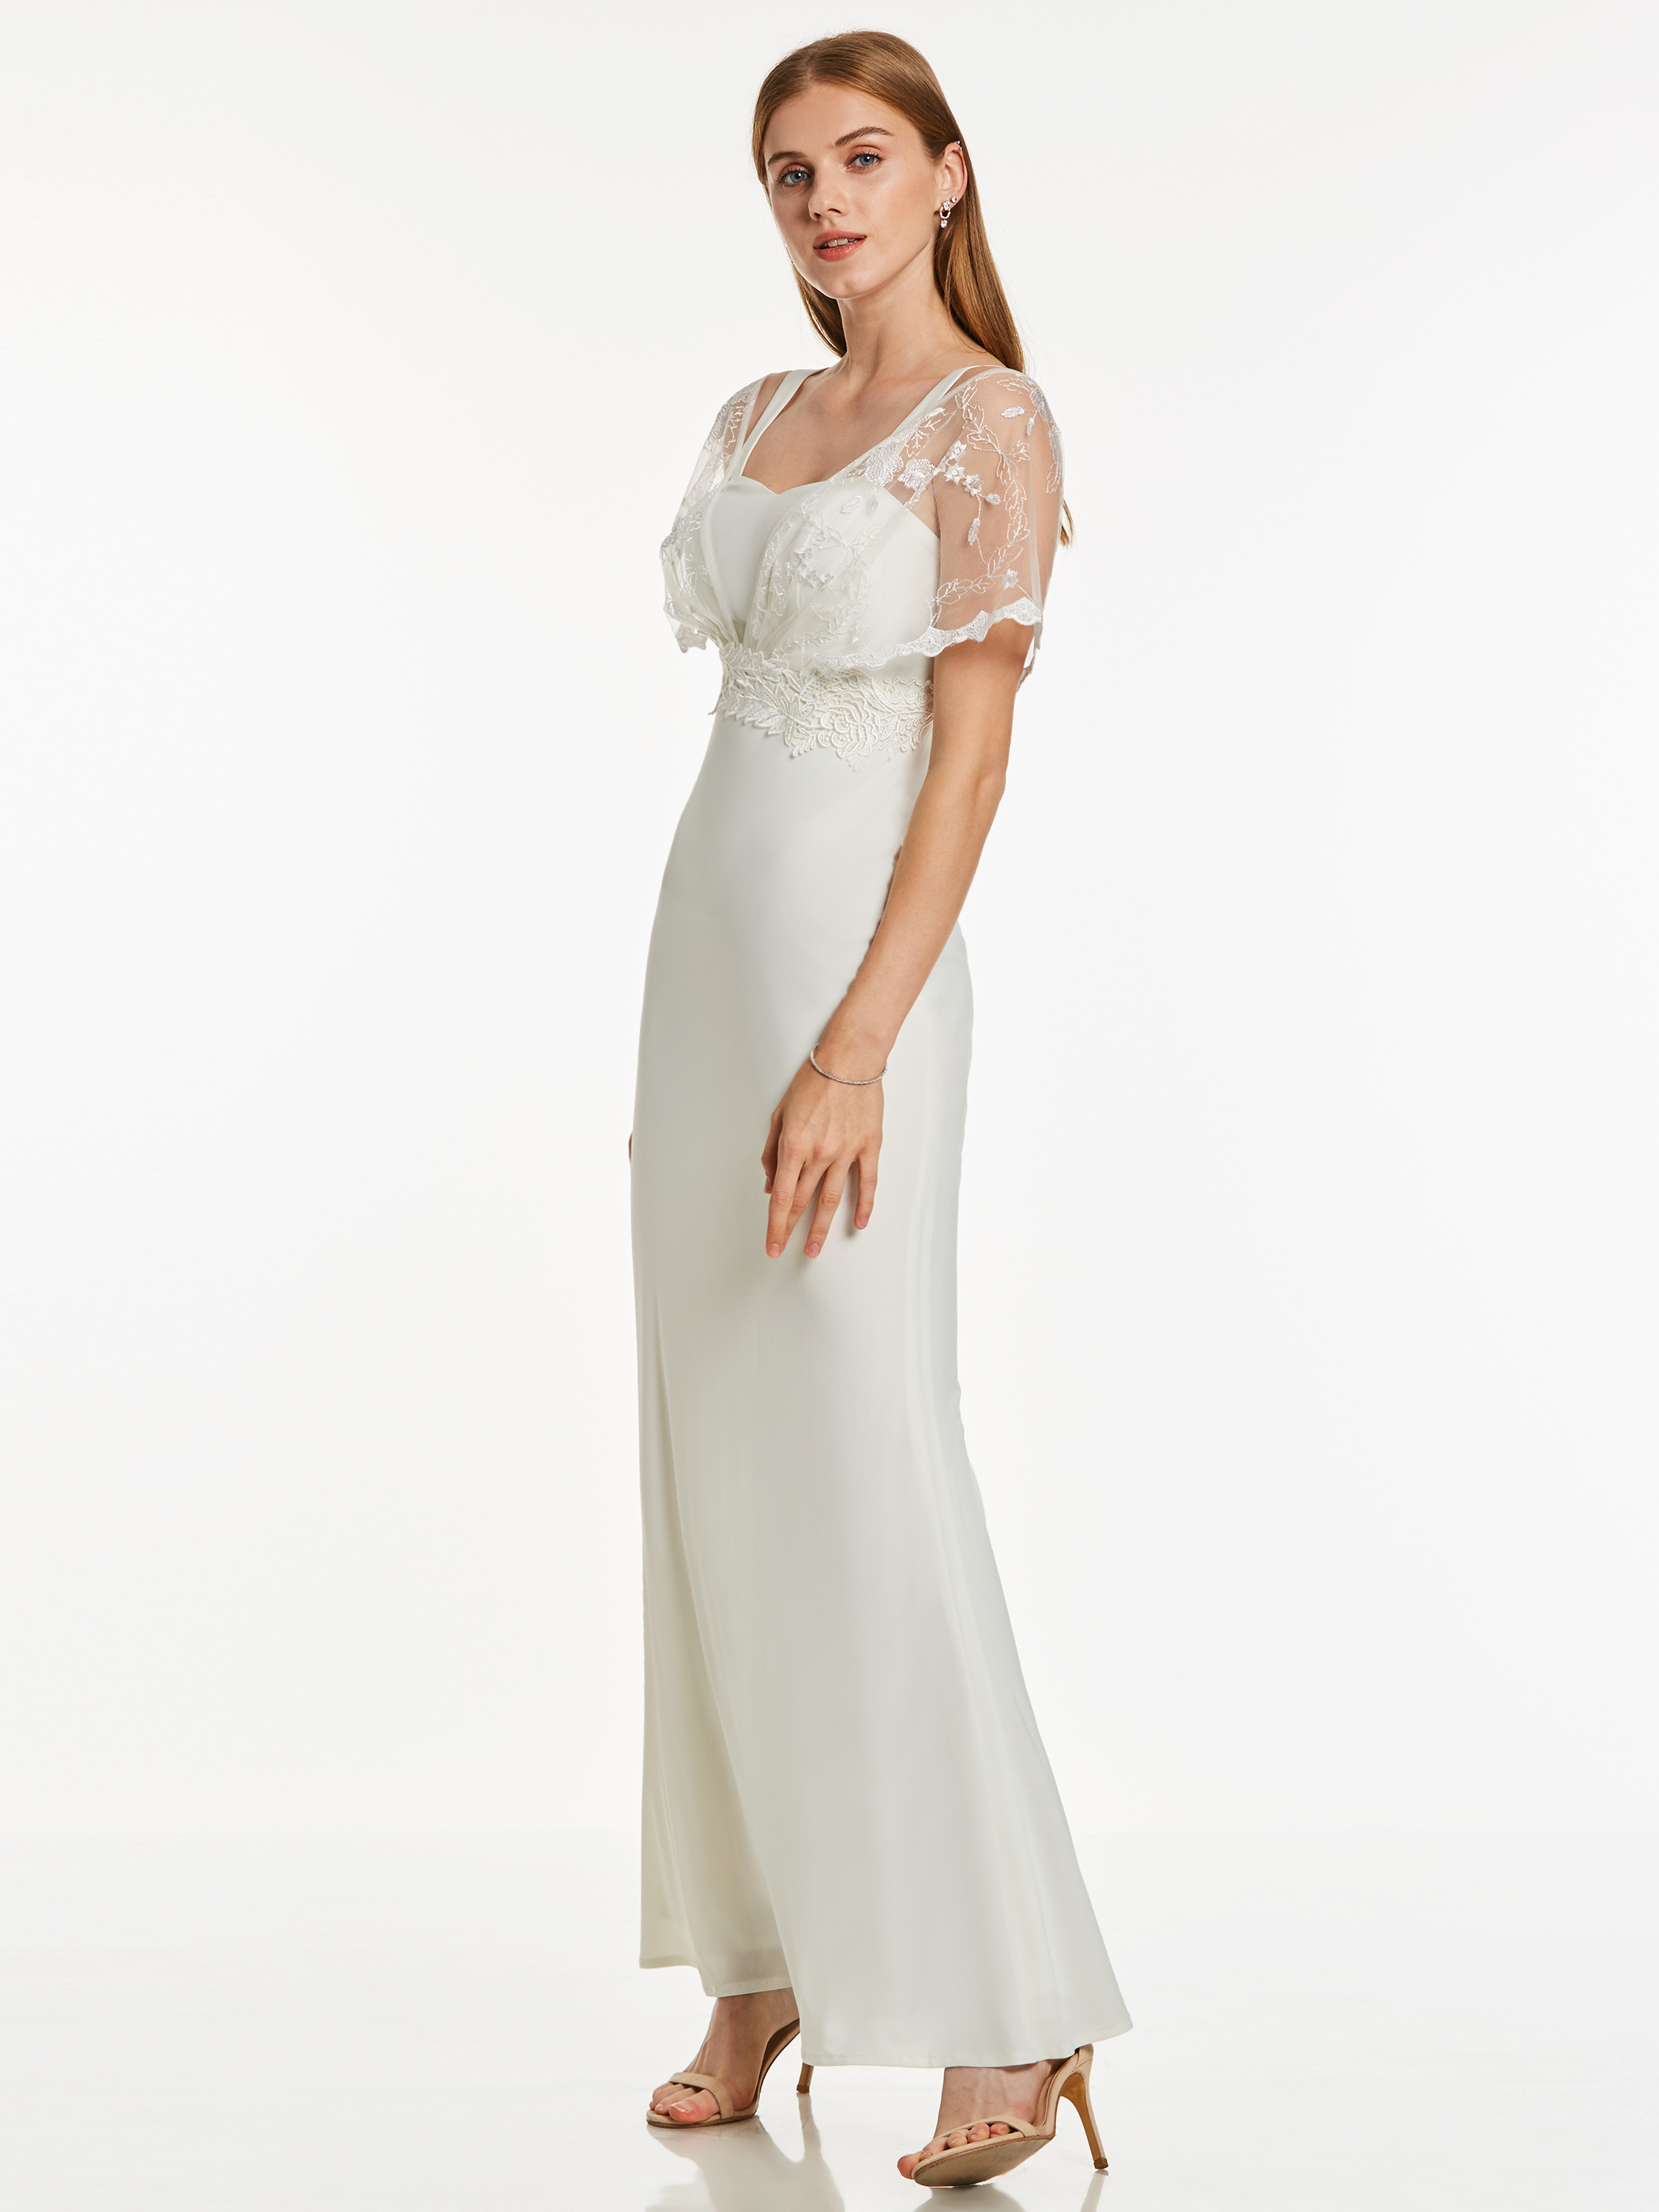 Dressv White Long Evening Dress Cheap Short Sleeves V Neck Sheath Appliques Wedding Party Formal Dress Evening Dresses